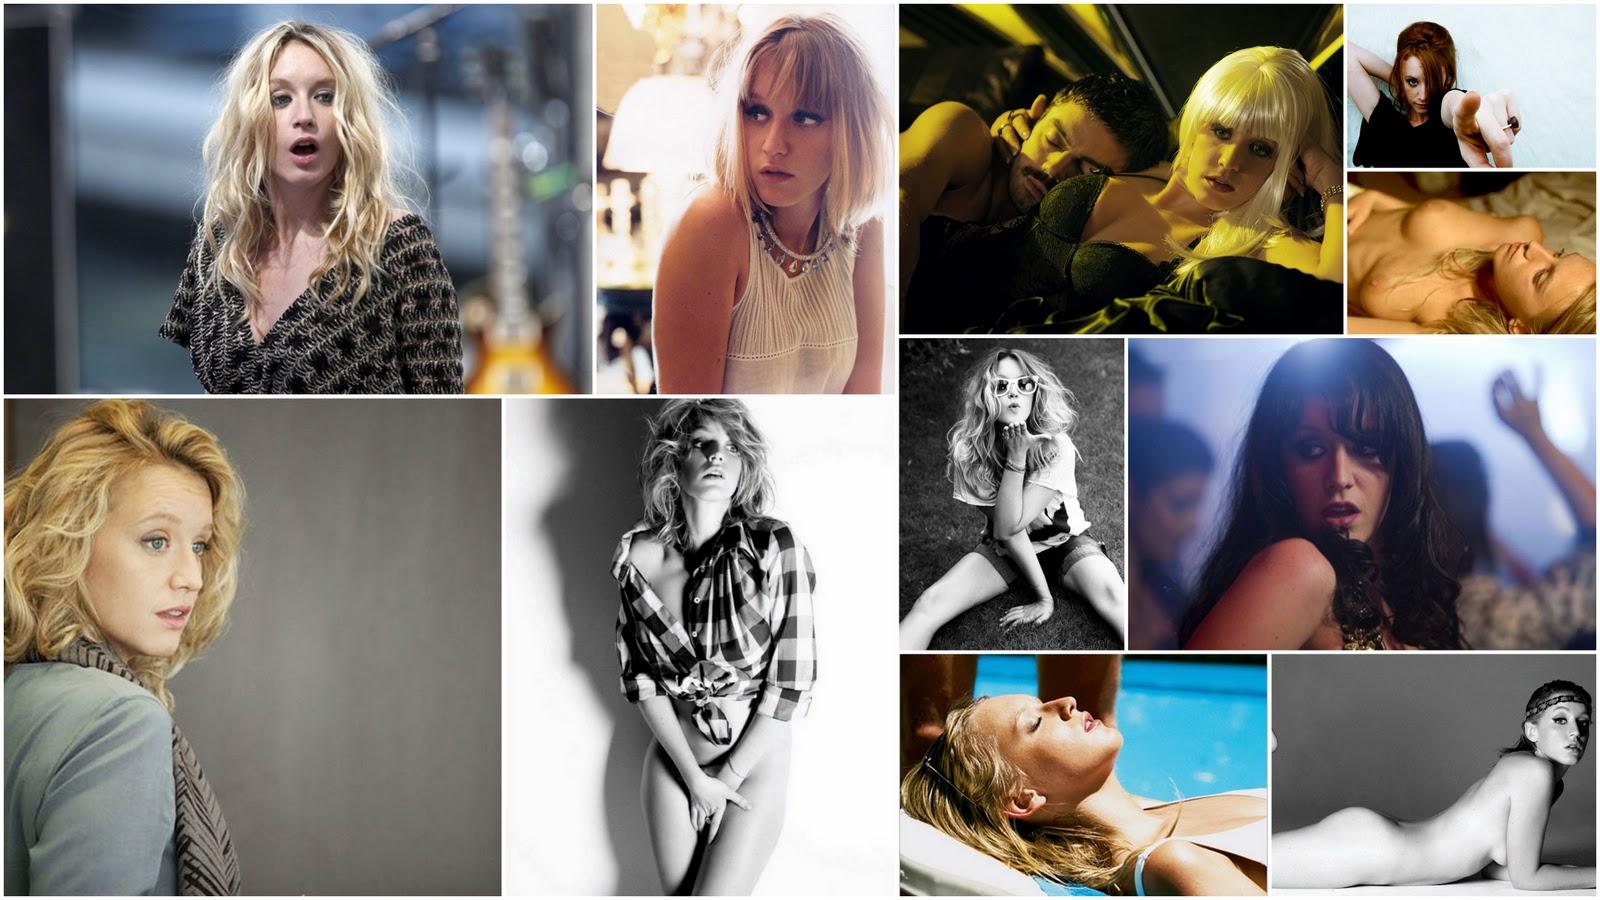 http://3.bp.blogspot.com/-sDZfWu3ahoI/Tt0prcOw-gI/AAAAAAAAIEE/eDp5Wr6AEYE/s1600/ludivine+sagnier+collage+02.jpg